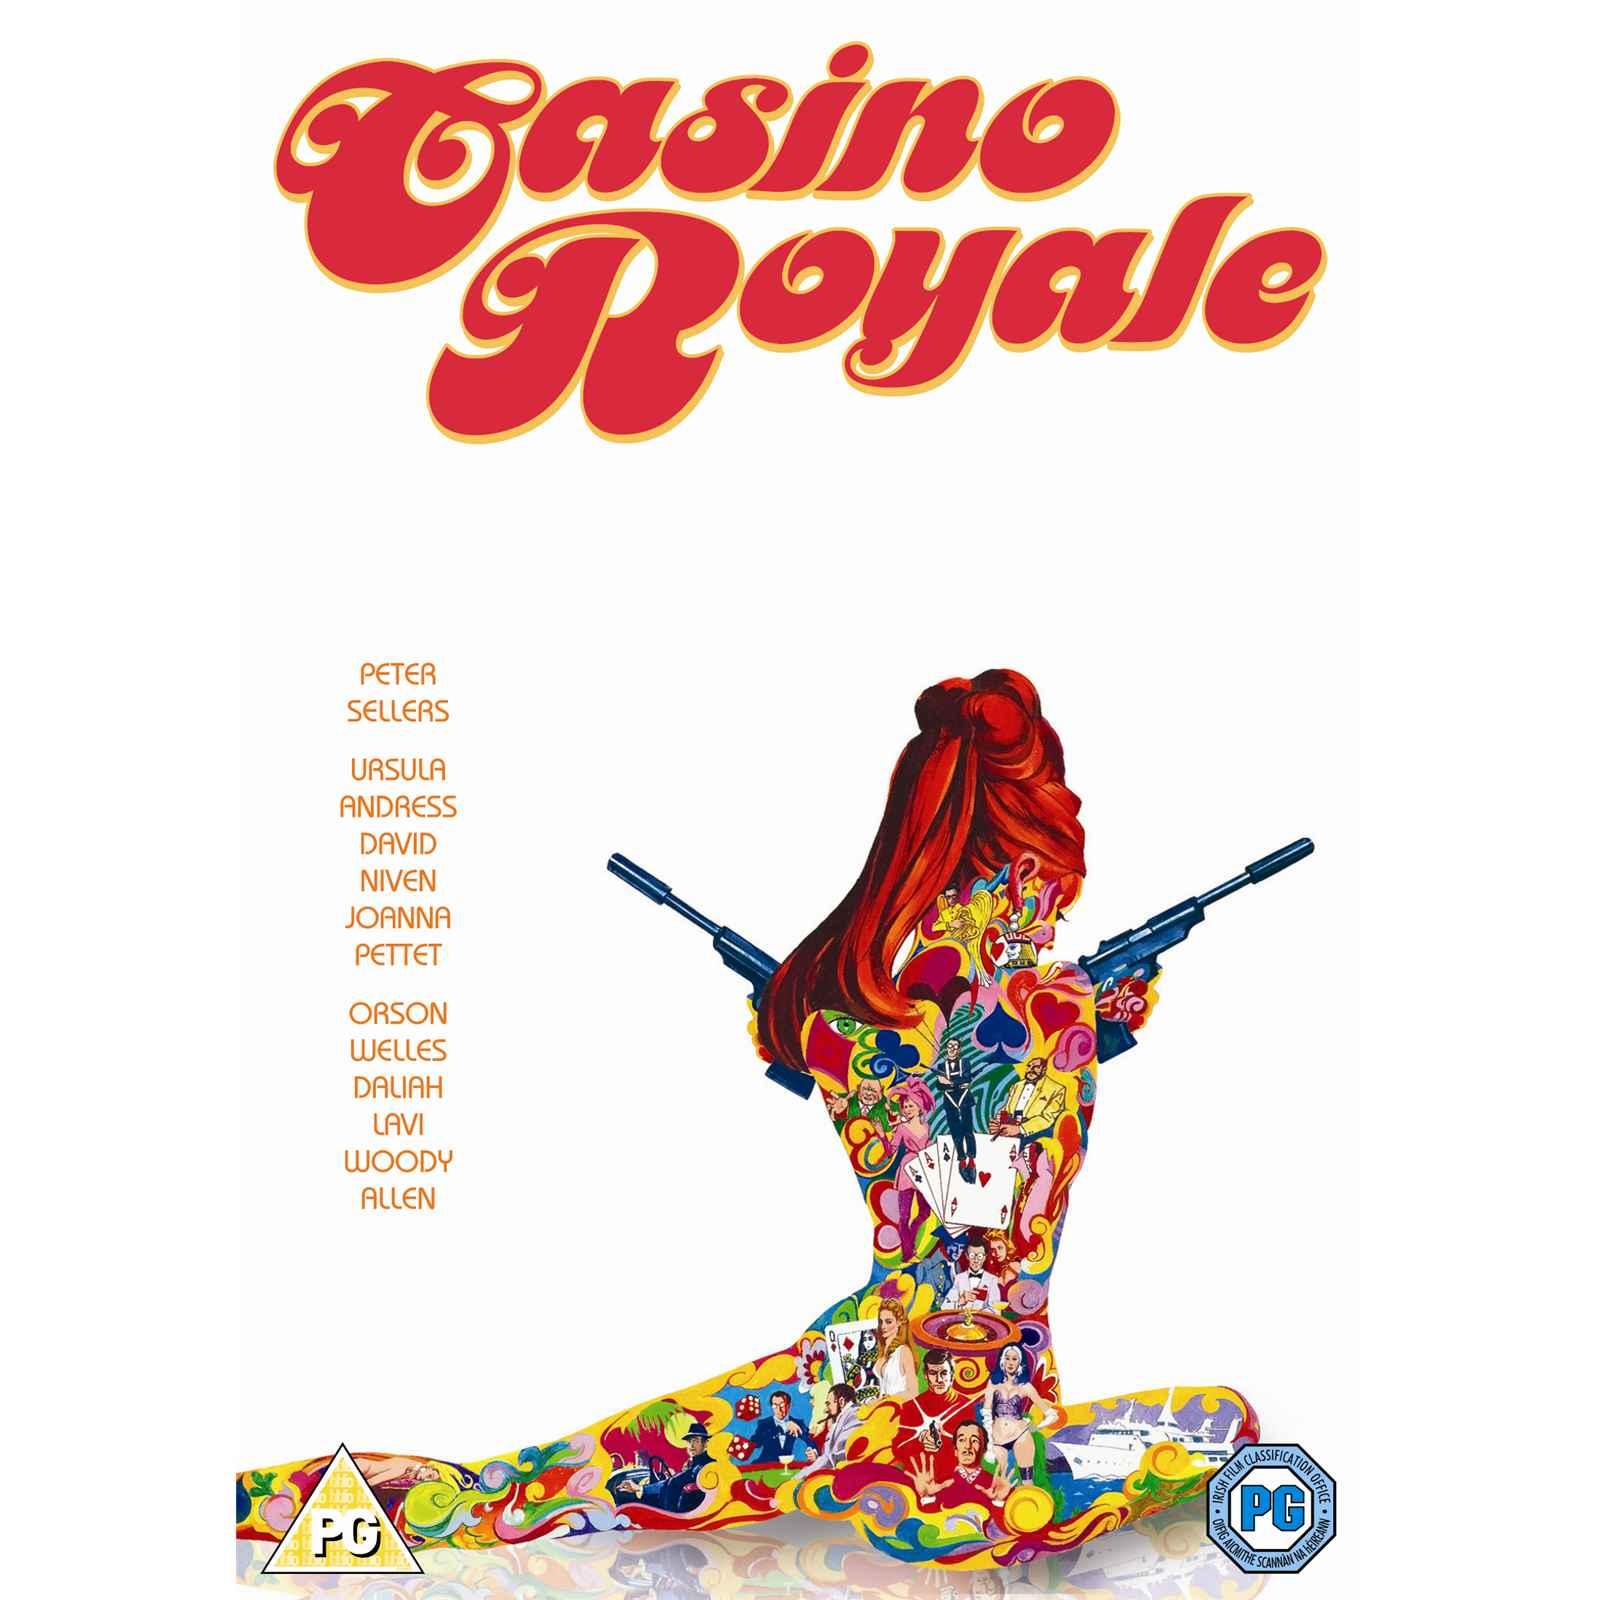 Bacharach 007 casino royale